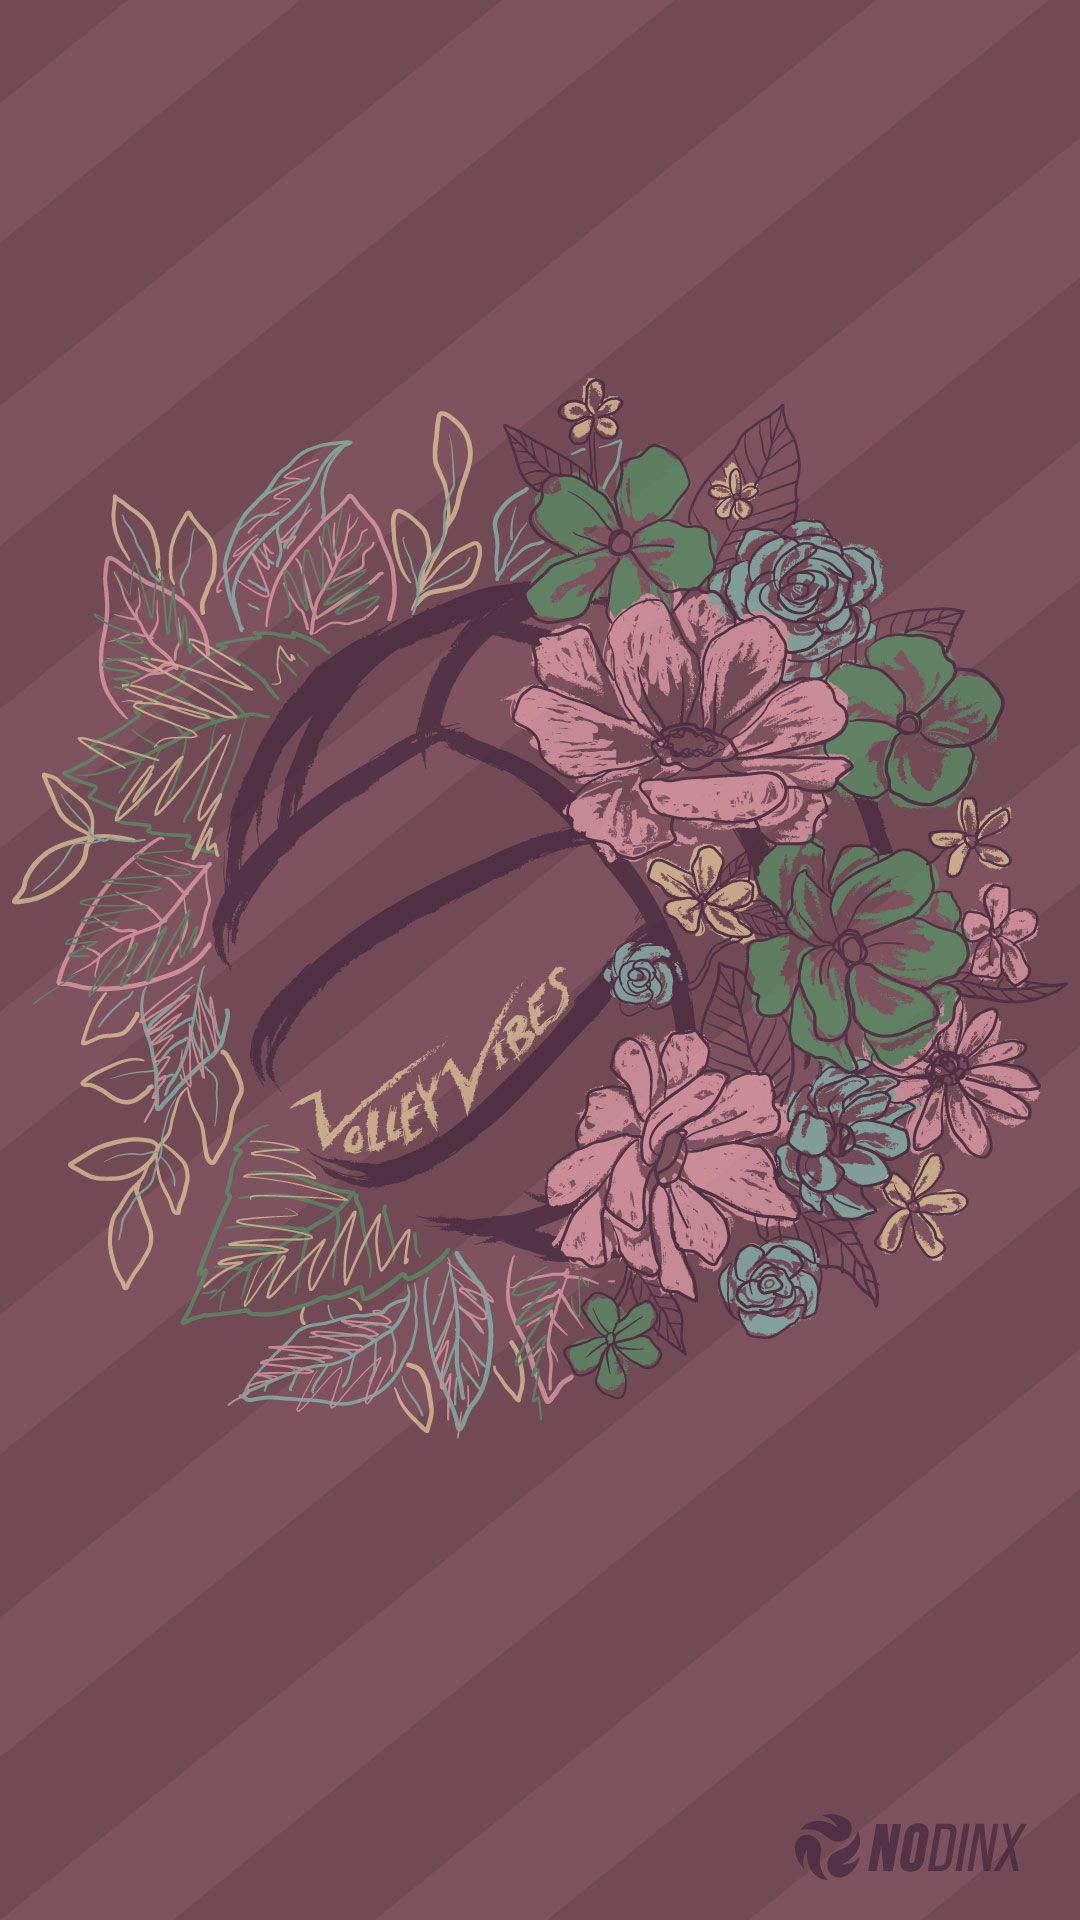 Alyssa Volleyball Vibes